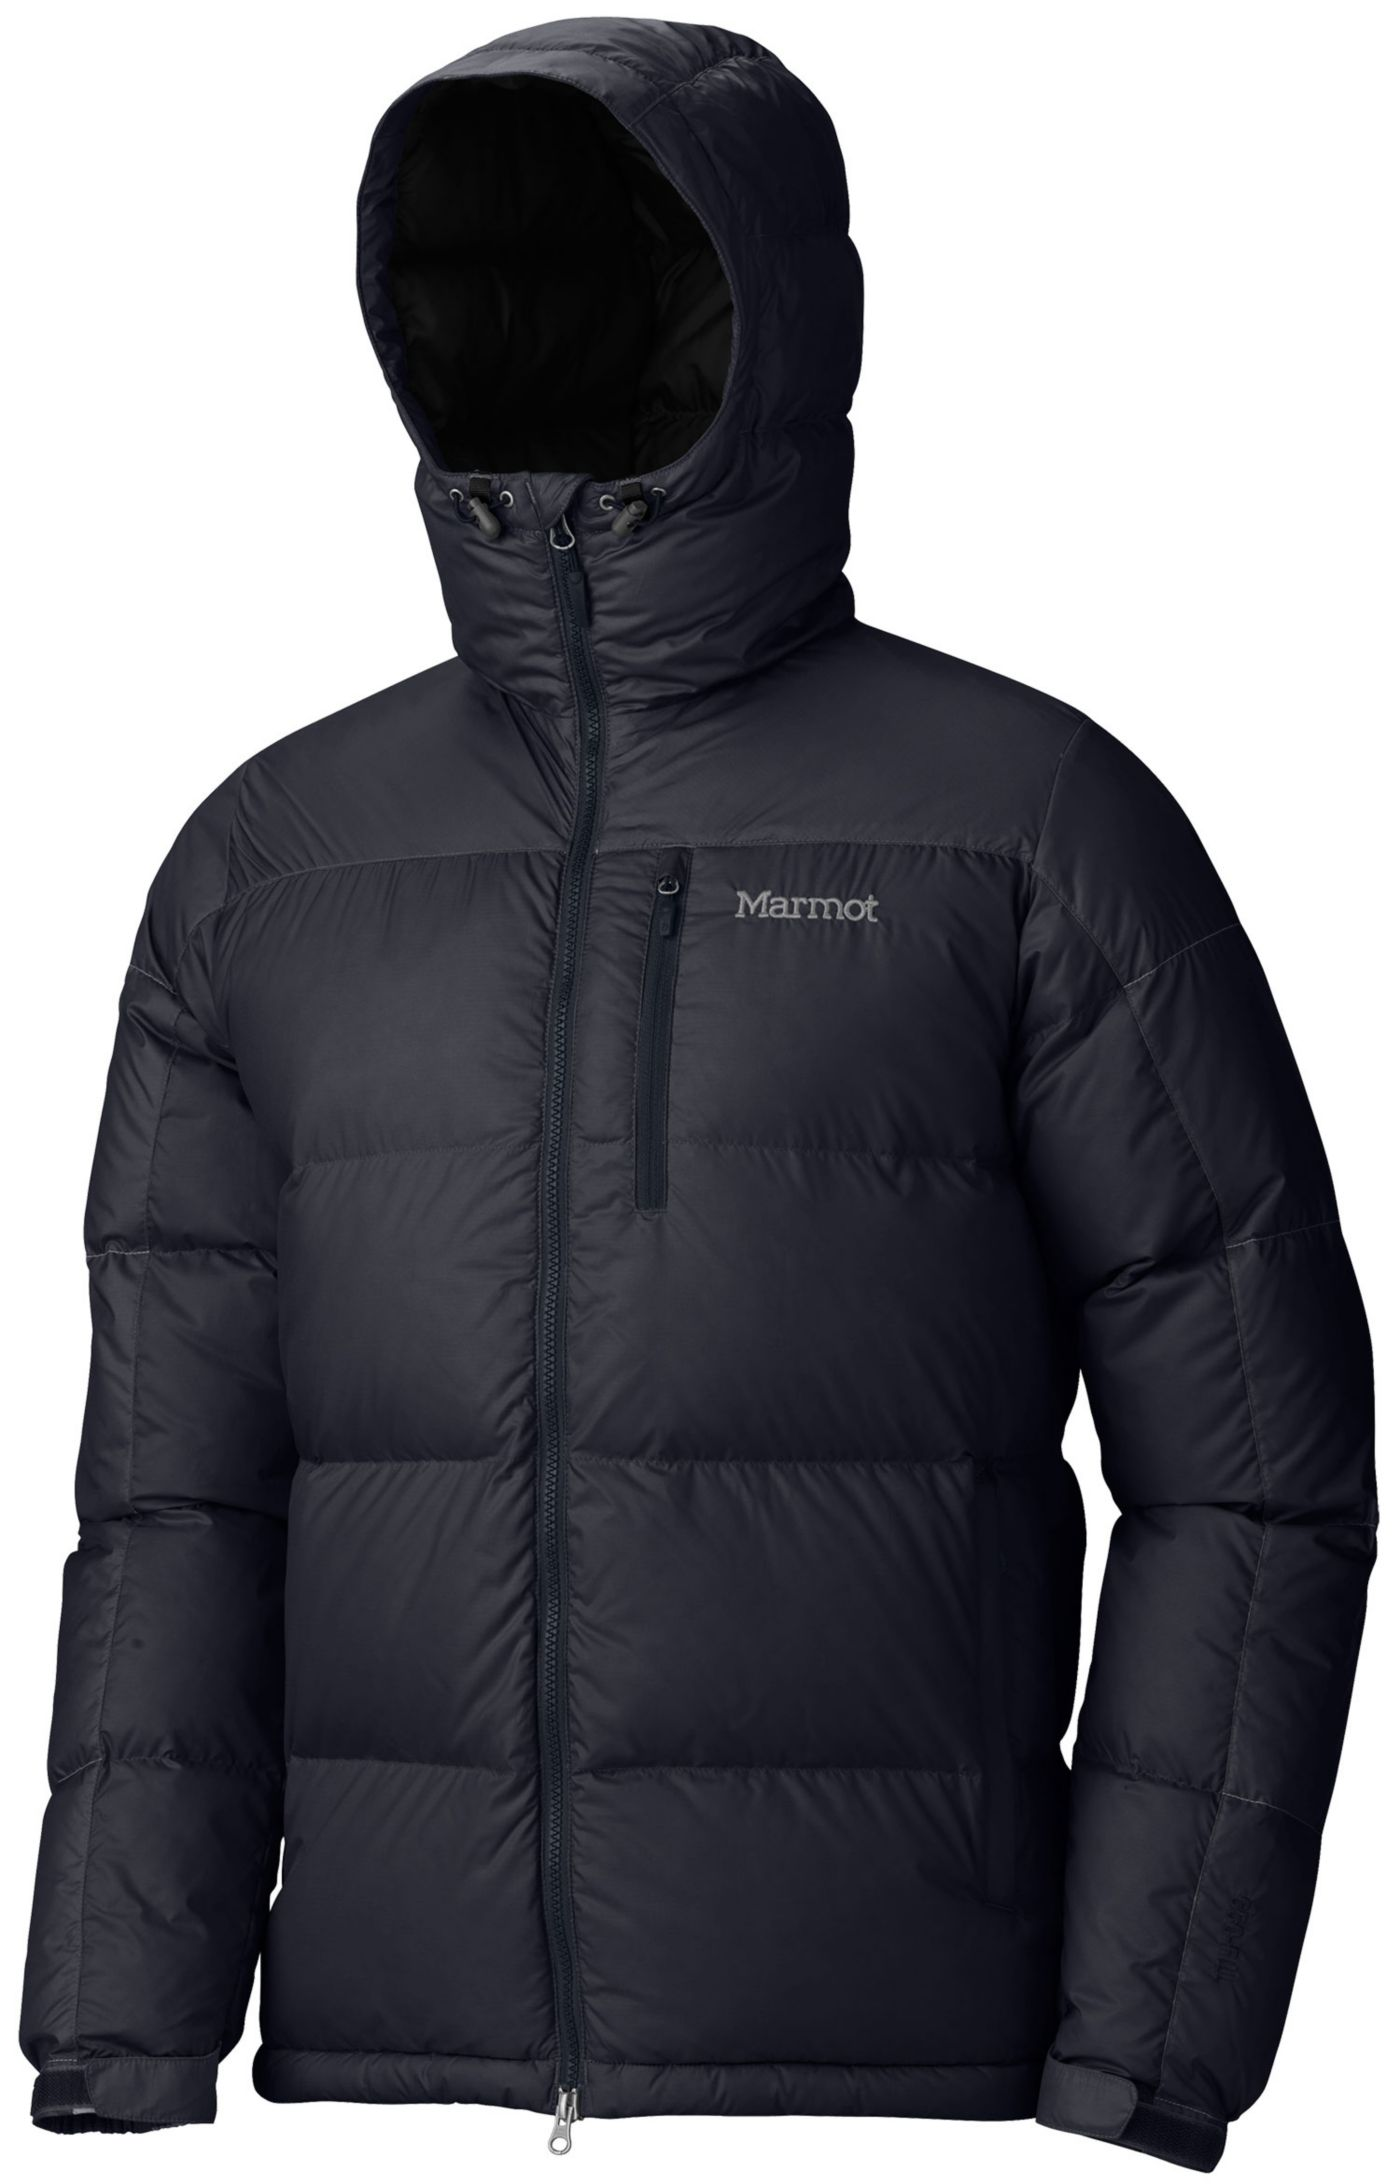 Marmot Men's Guides Down Hoodie Jacket